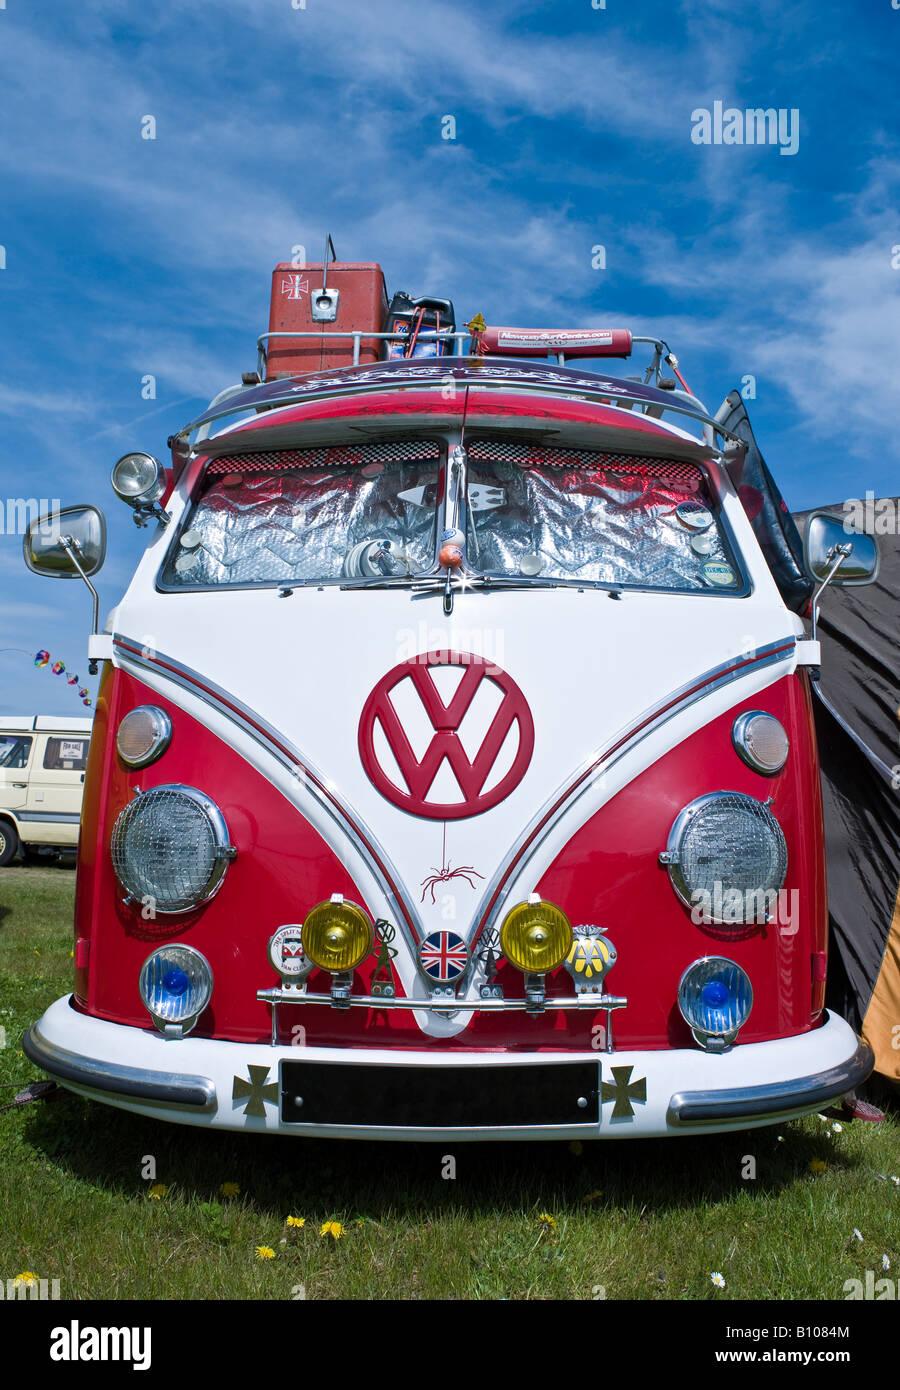 vw volkswagen split screen bus camper van variant bug beetle engine lowered modified red hippie hippy 1960s in a - Stock Image